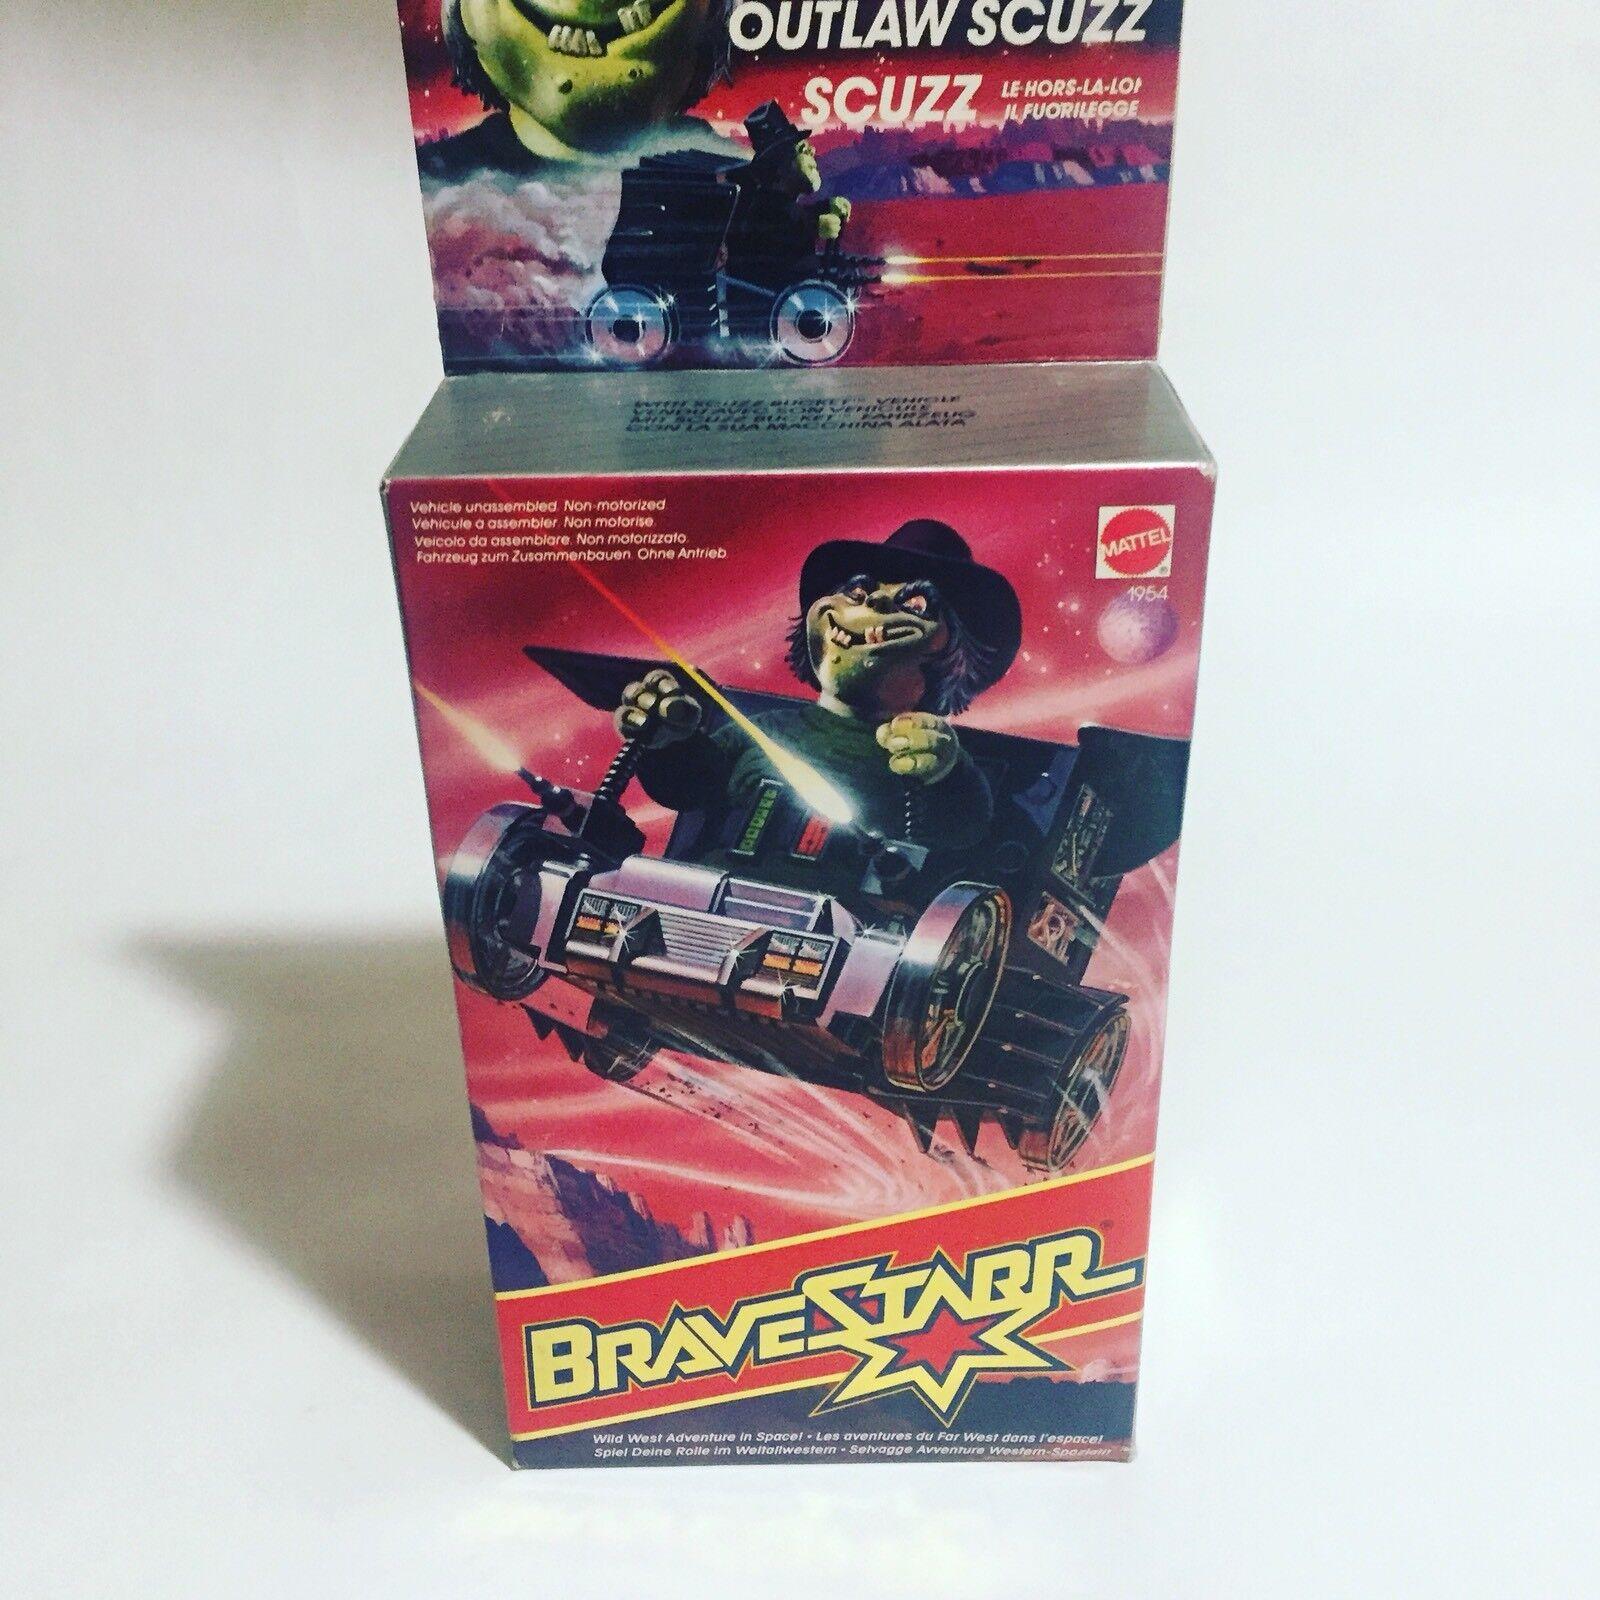 Bravestarr Mattel Outlaw Scuzz Scuzz Action Figure Mattel